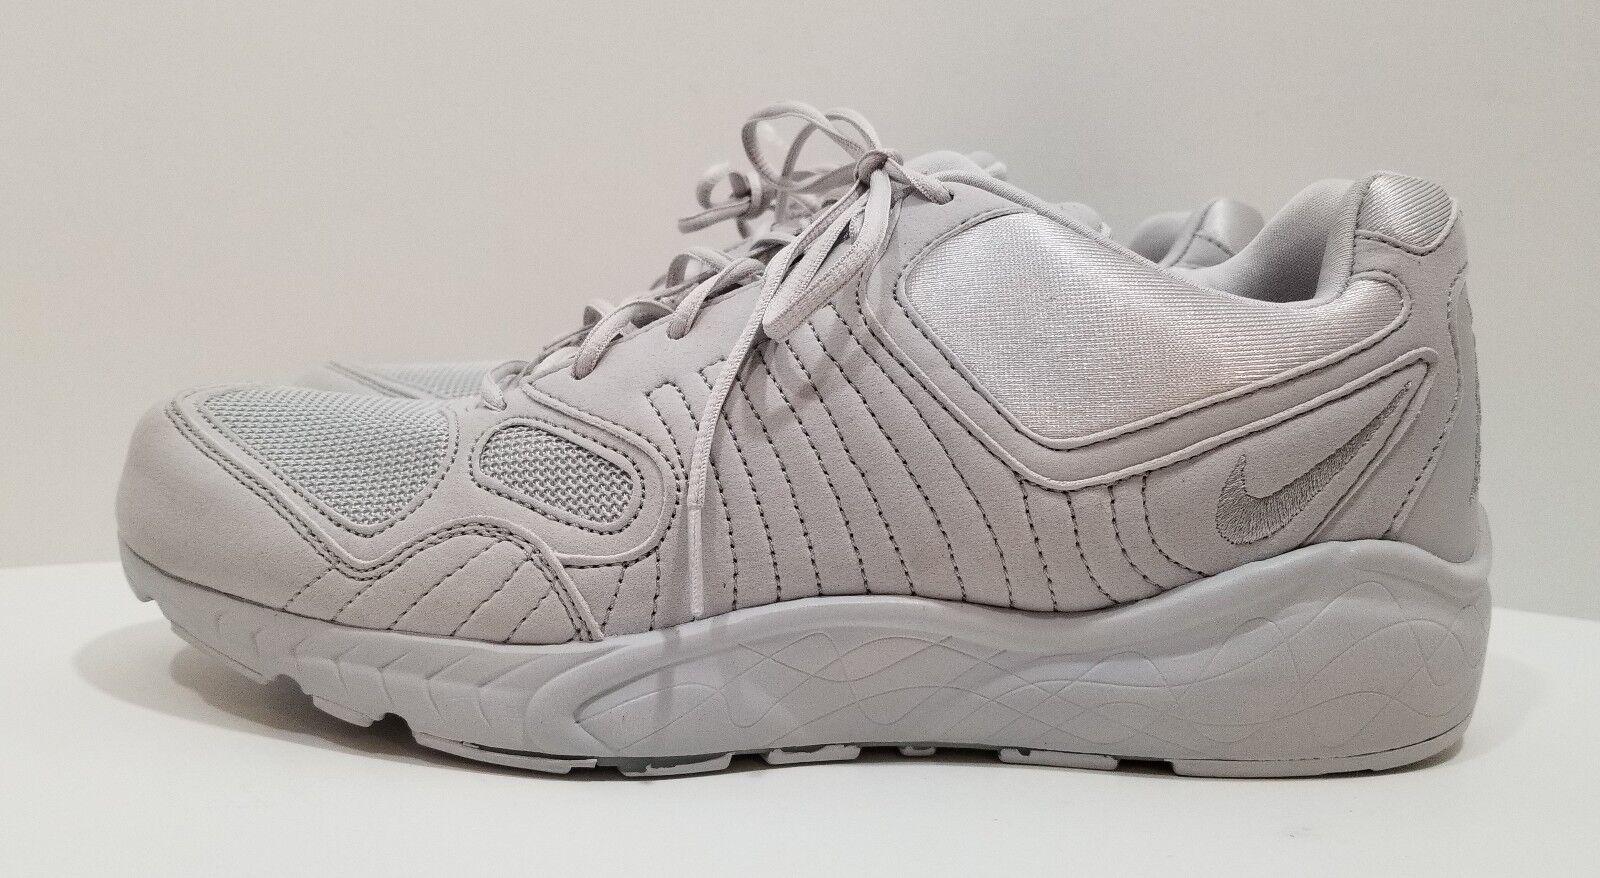 Nike Air Zoom Talaria '16 Mens Running Shoes Neutral Grey Mens Comfortable